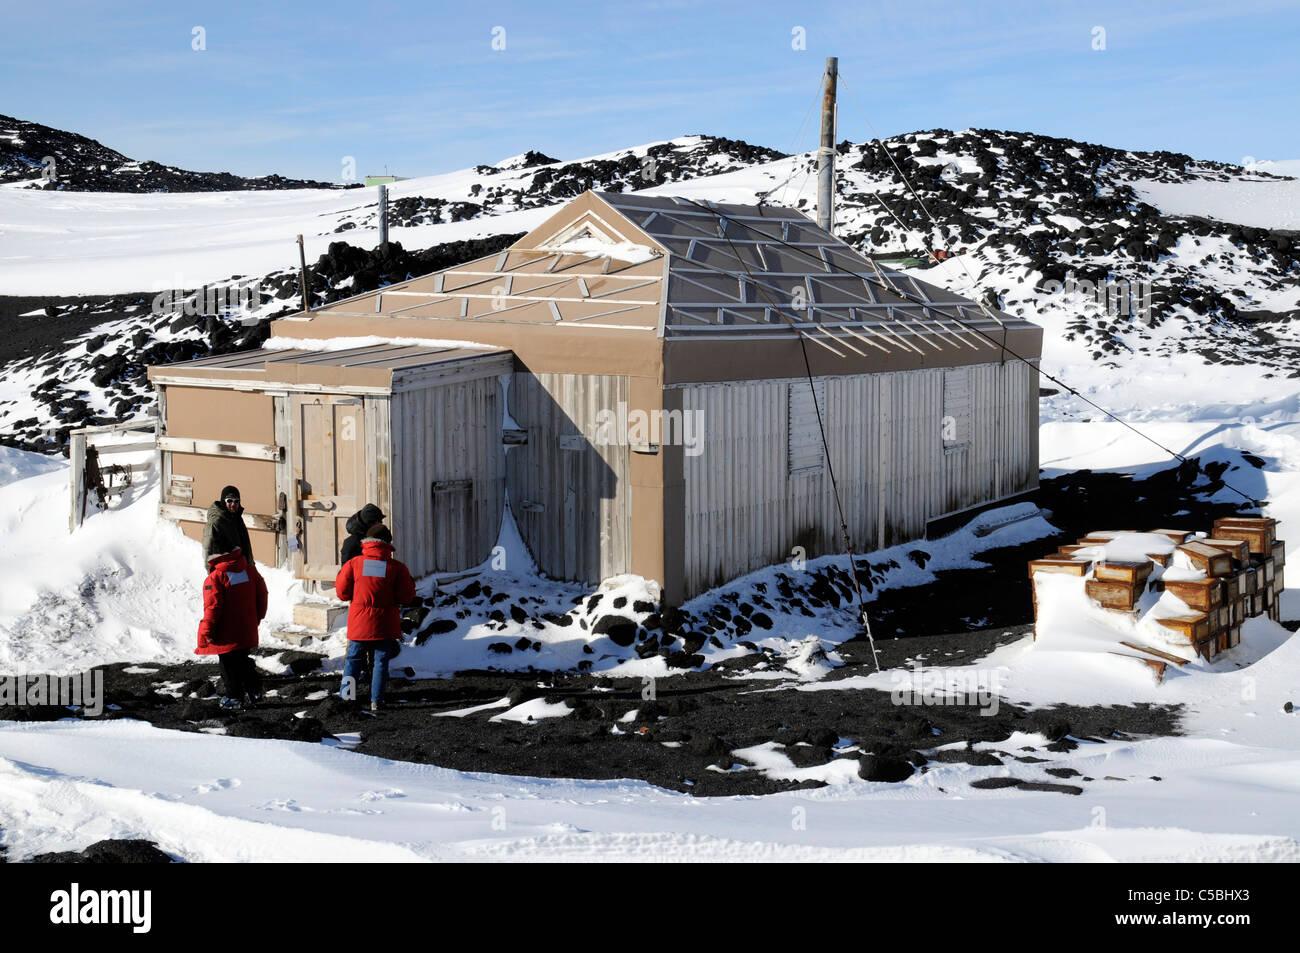 Historic Shackleton's Hut Cape Royds Antarctica - Stock Image